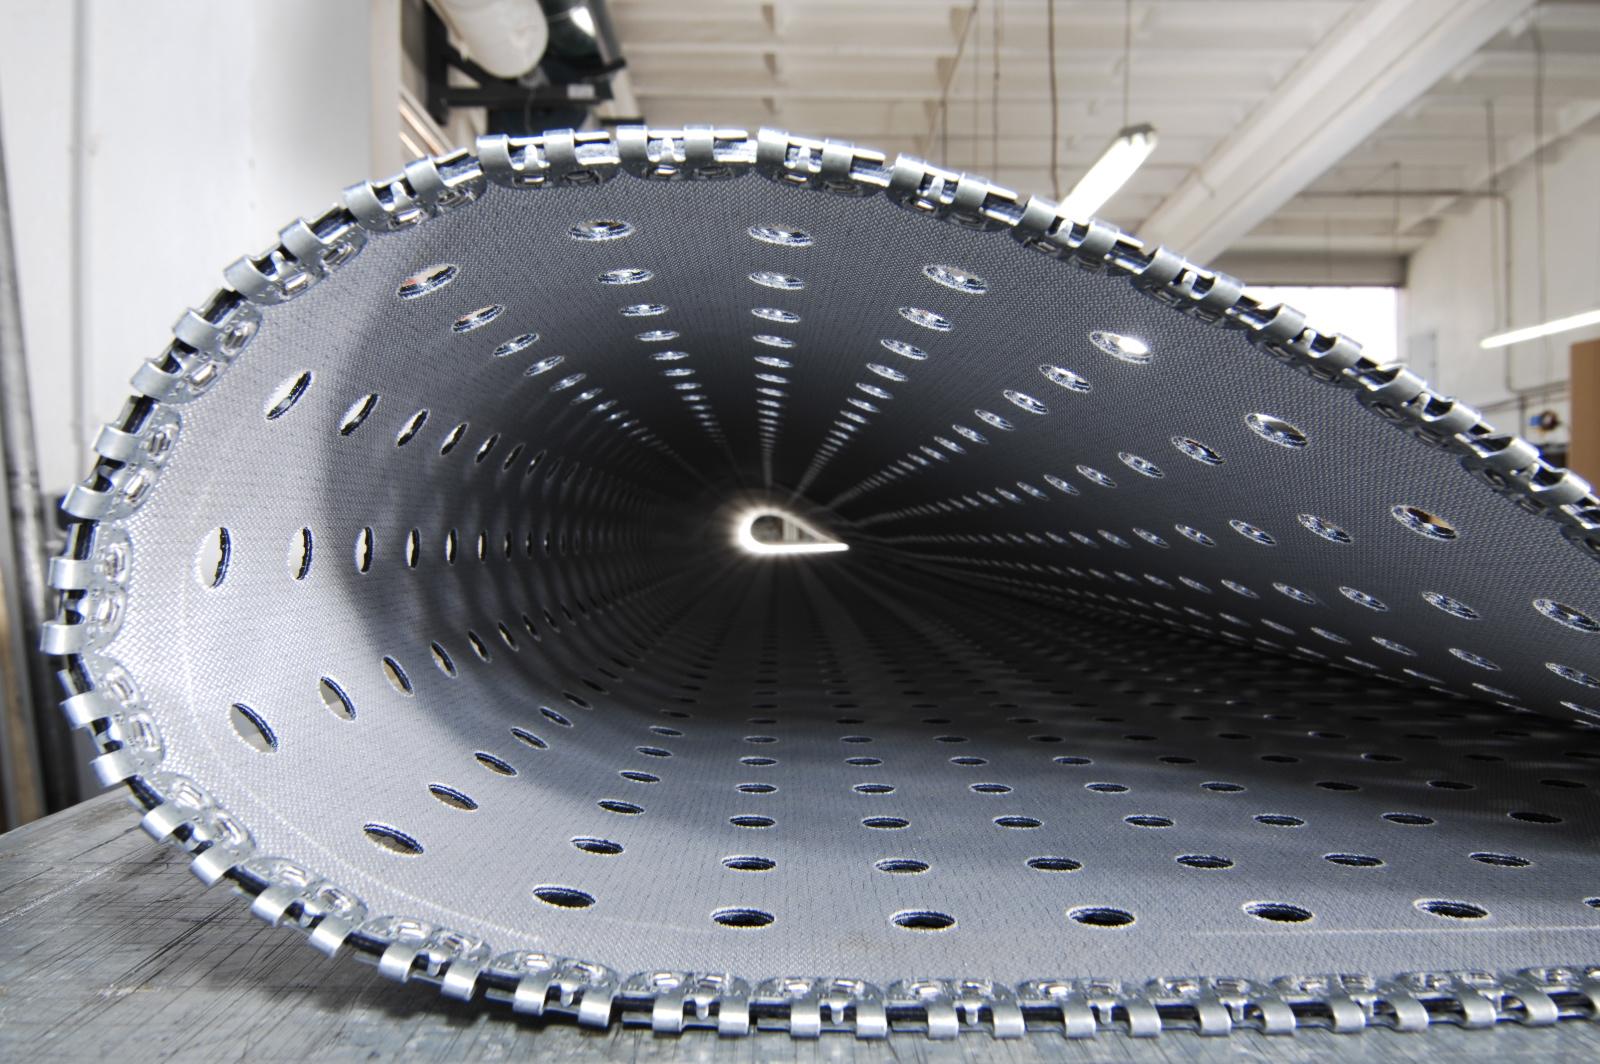 TipTop Industrievulkanisation Borna GmbH Kunststoffbänder u. Riemen